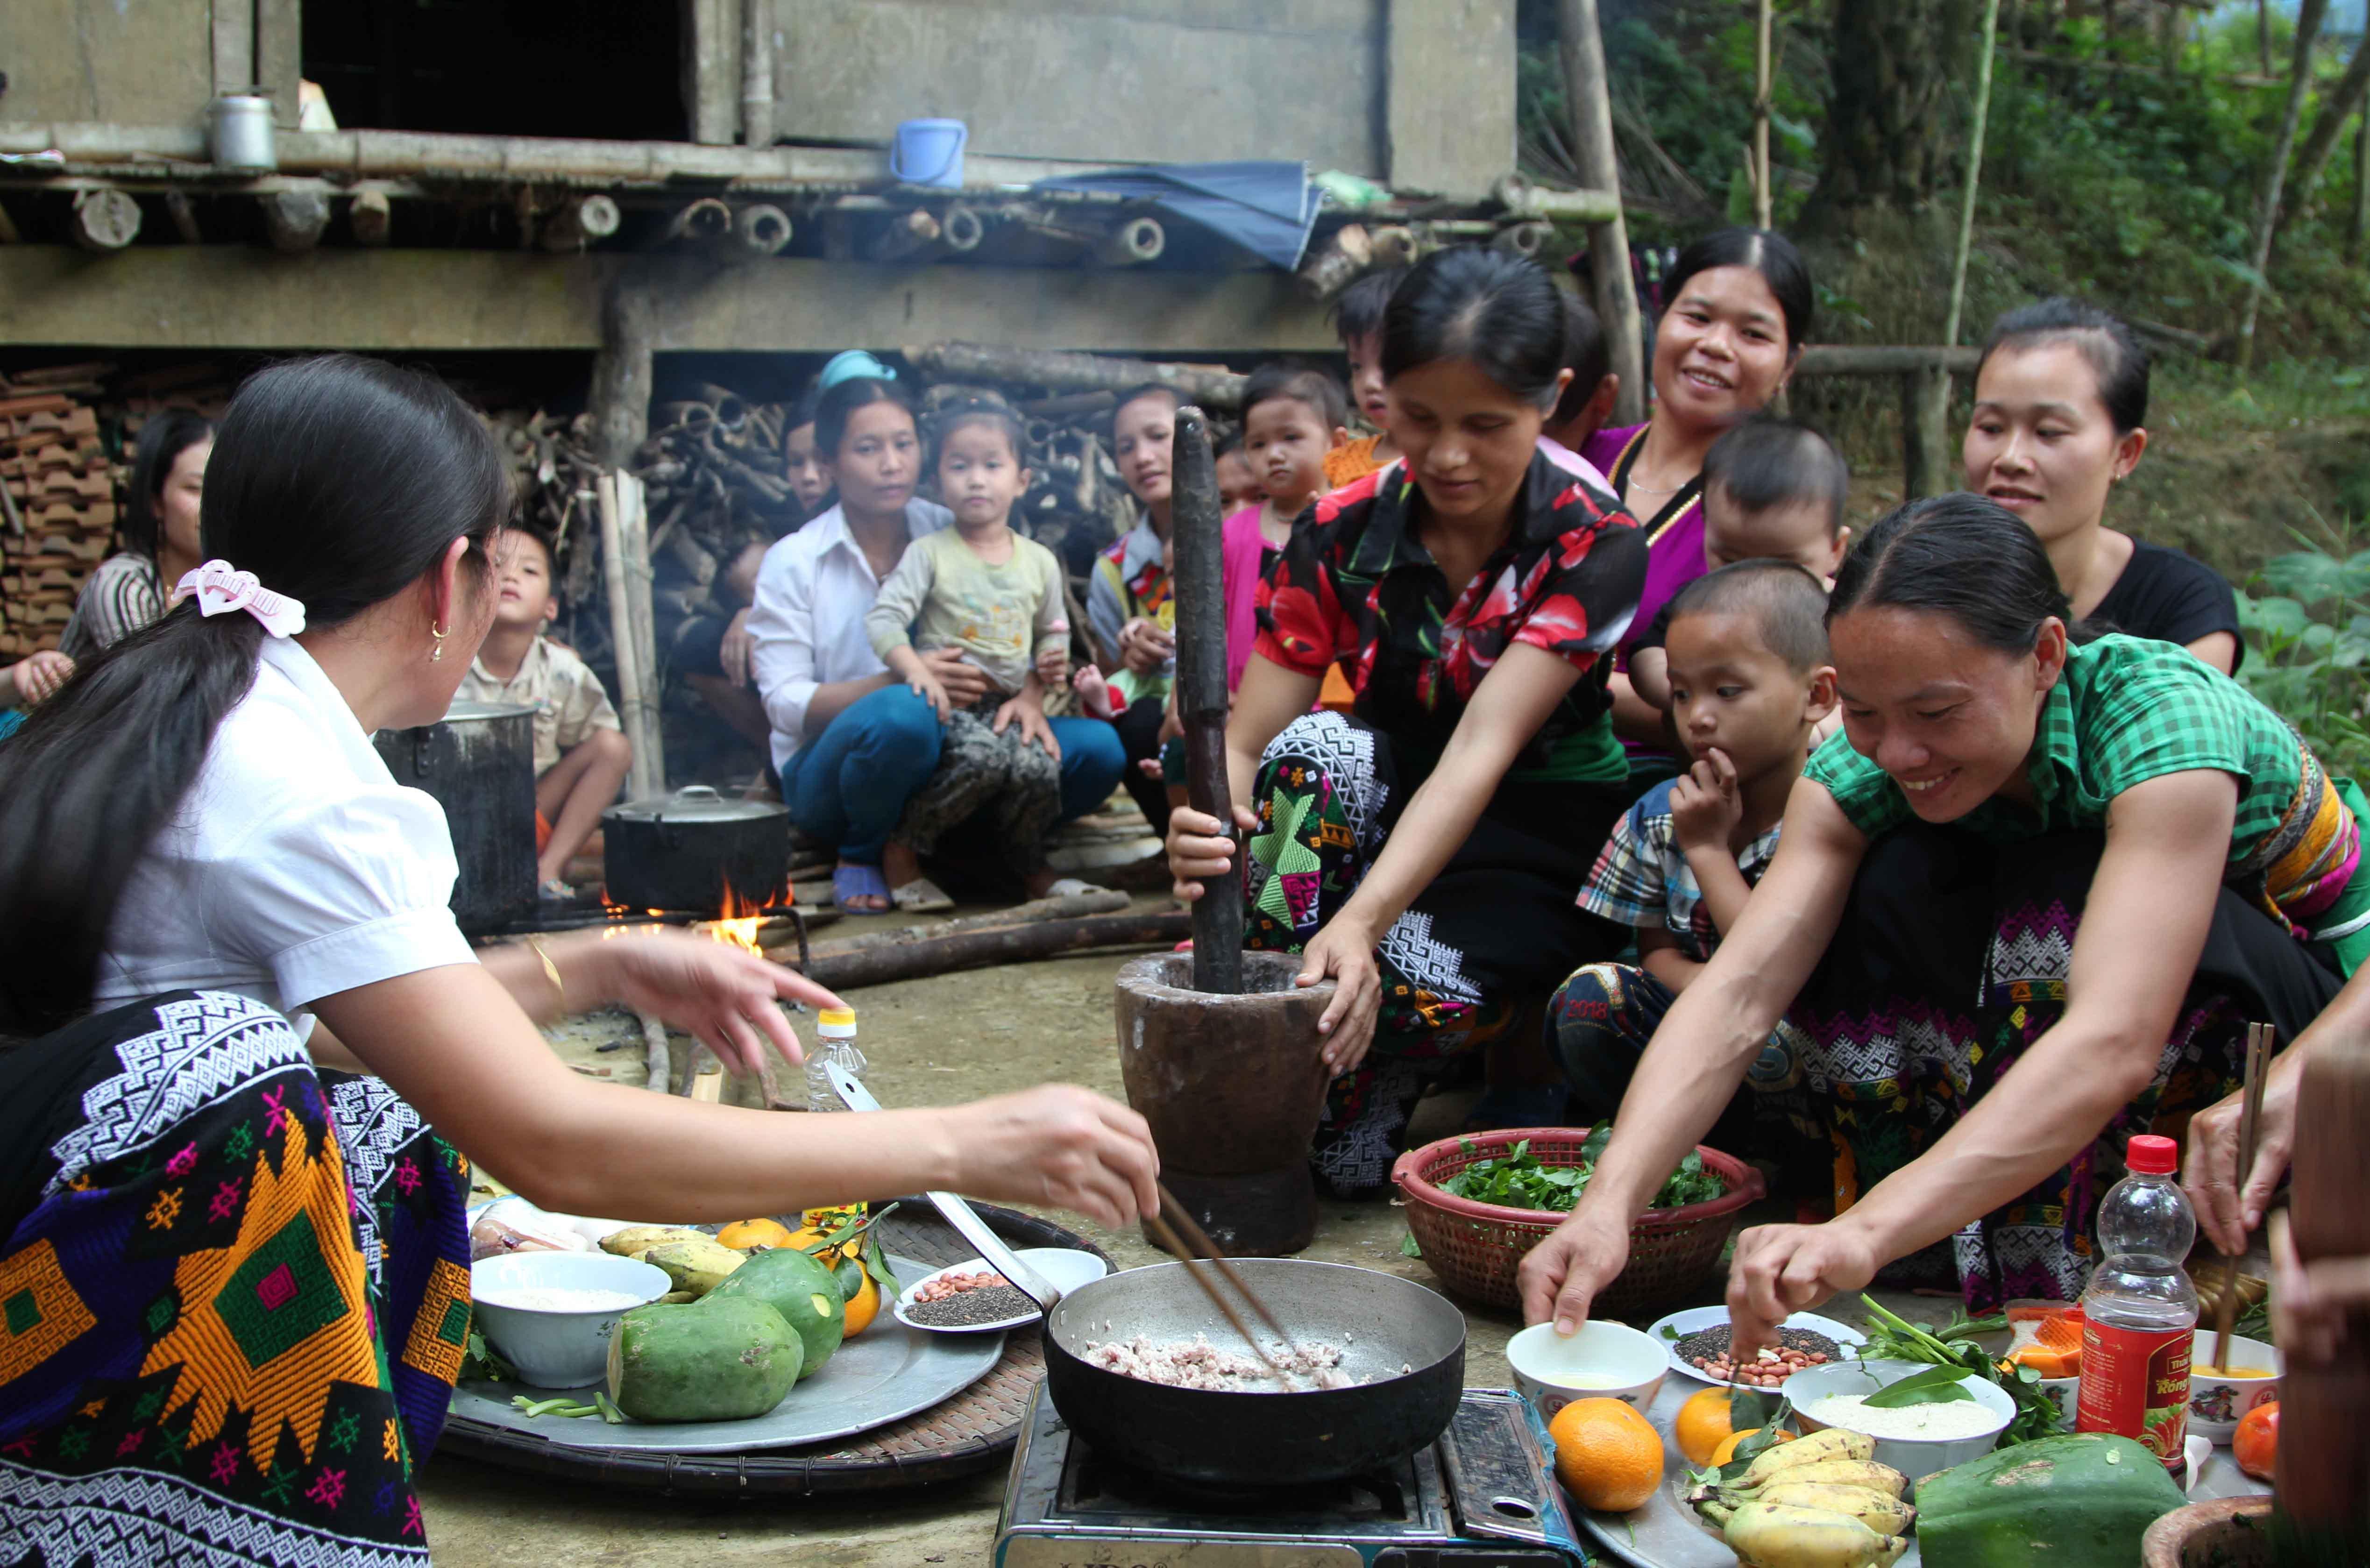 Sponsorship-s150921-4-Quan Son ADP-Vietnam (5)_711329 Nutrition Club.jpg